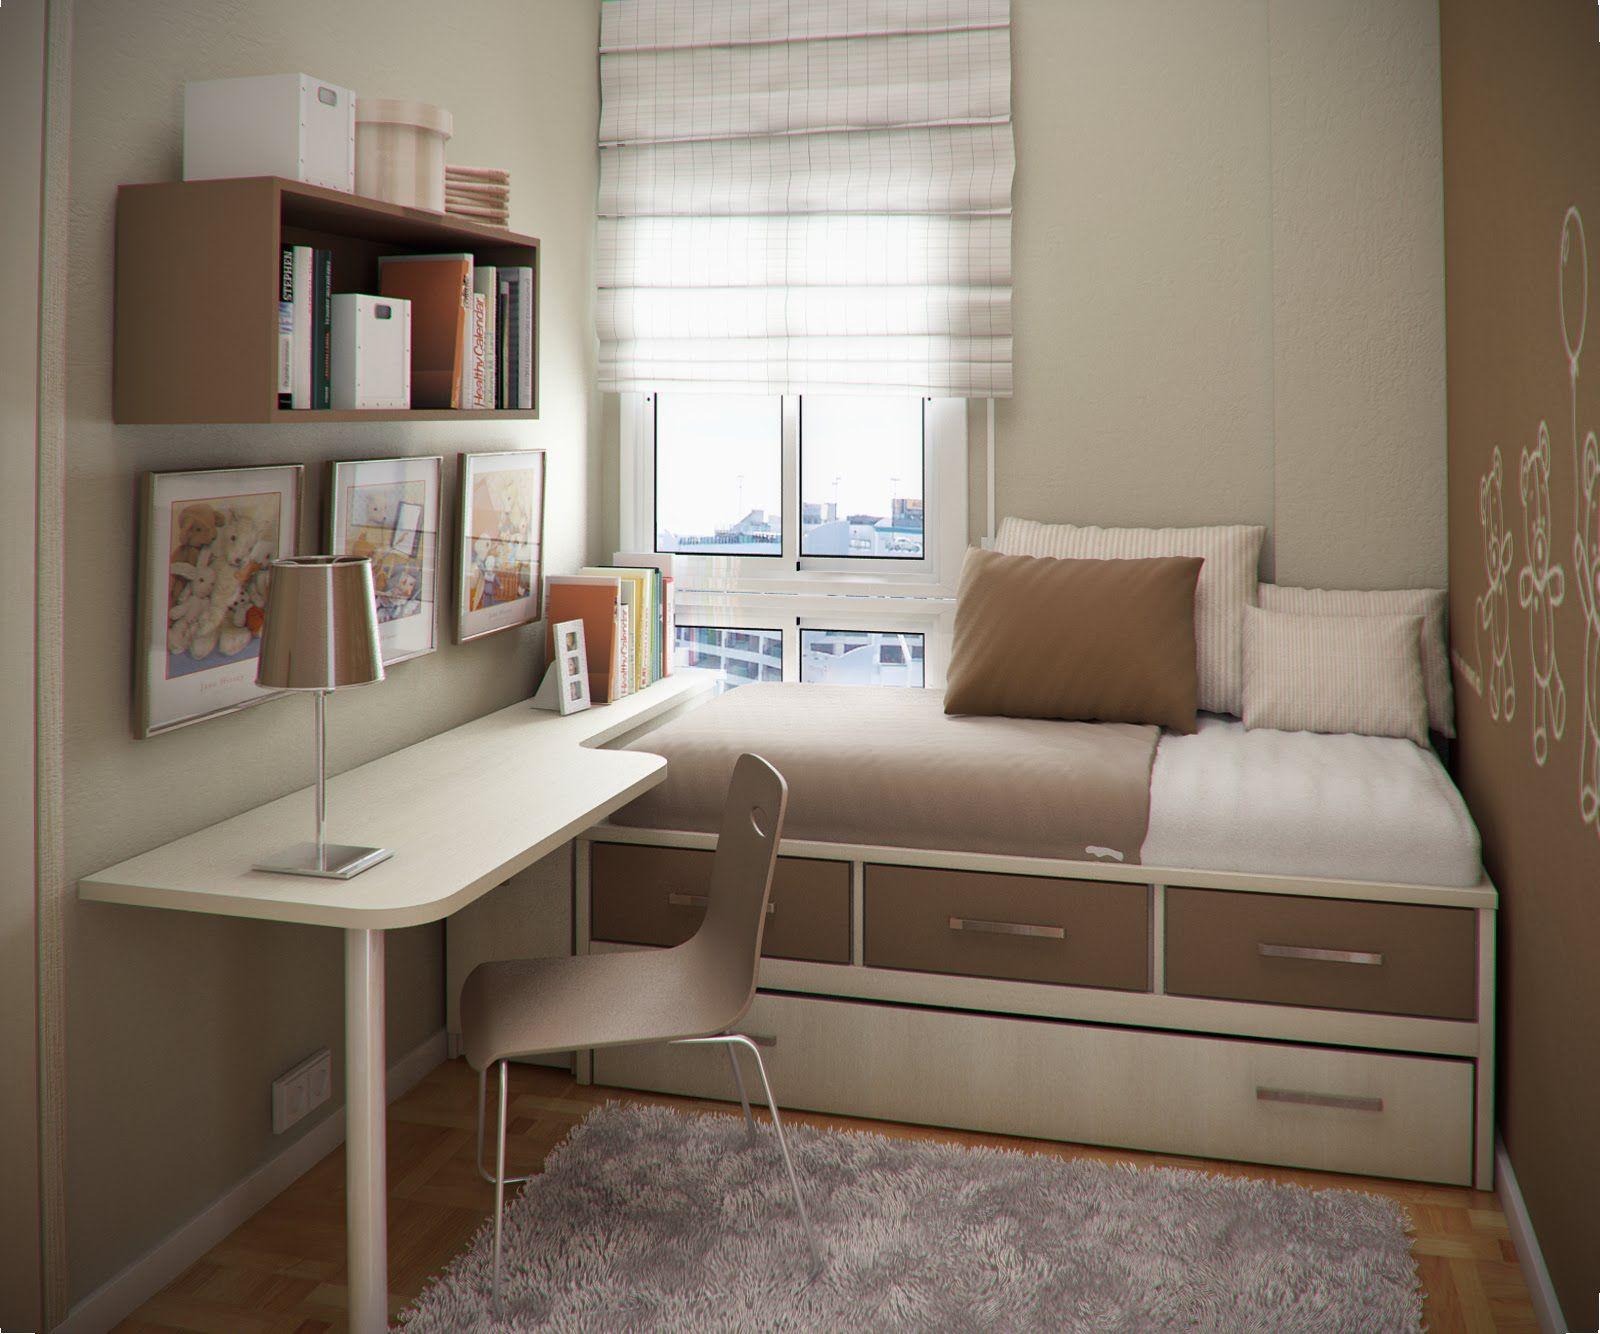 Kleines Gästezimmer Einrichten modern lokum pomysły na mały wąski pokój dziecka bedroom style